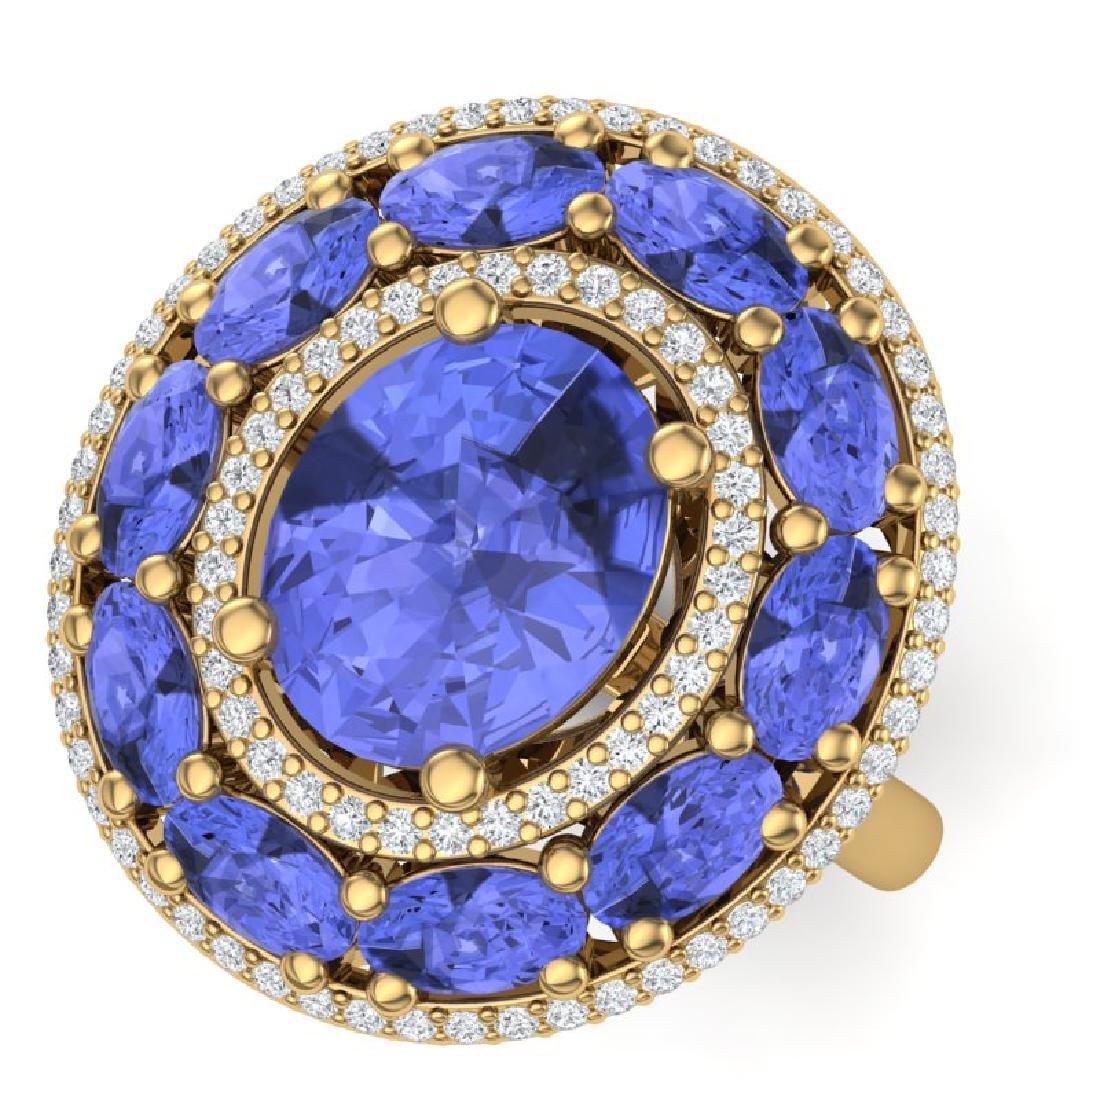 8.49 CTW Royalty Tanzanite & VS Diamond Ring 18K Yellow